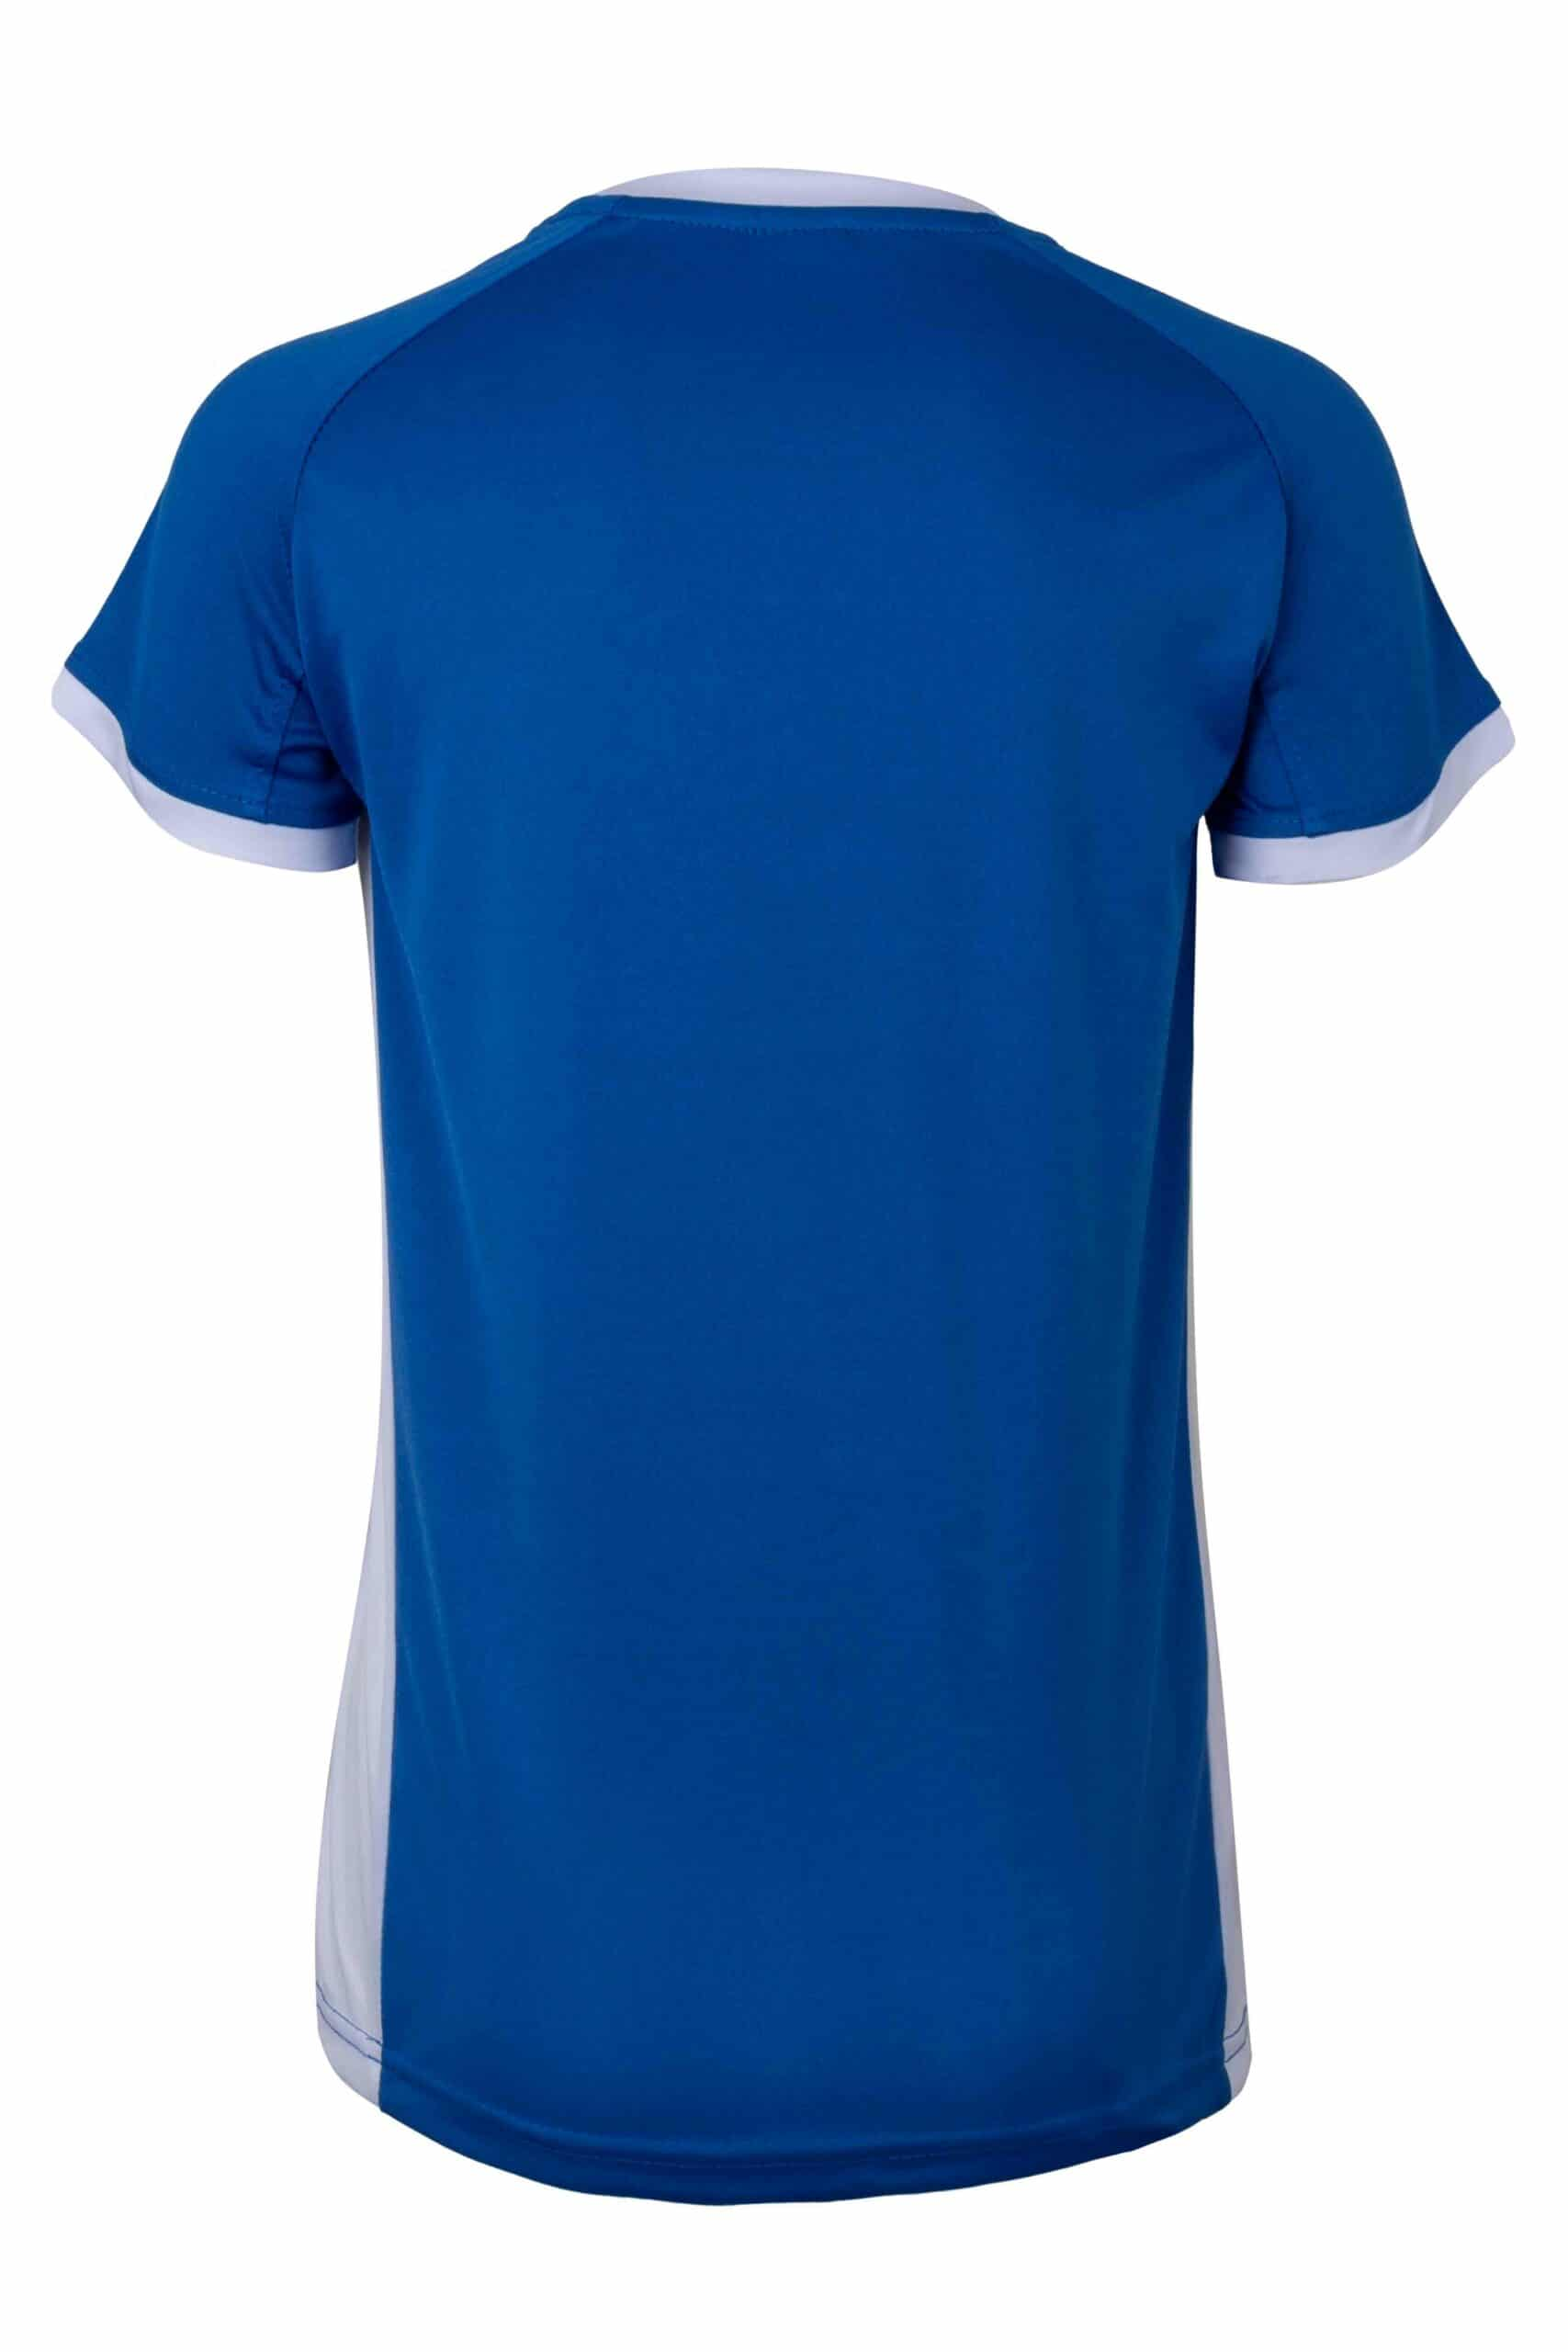 Mukua Mk531v Camiseta TÉcnica Manga Corta Bicolor NiÑo Royal Blue White 2